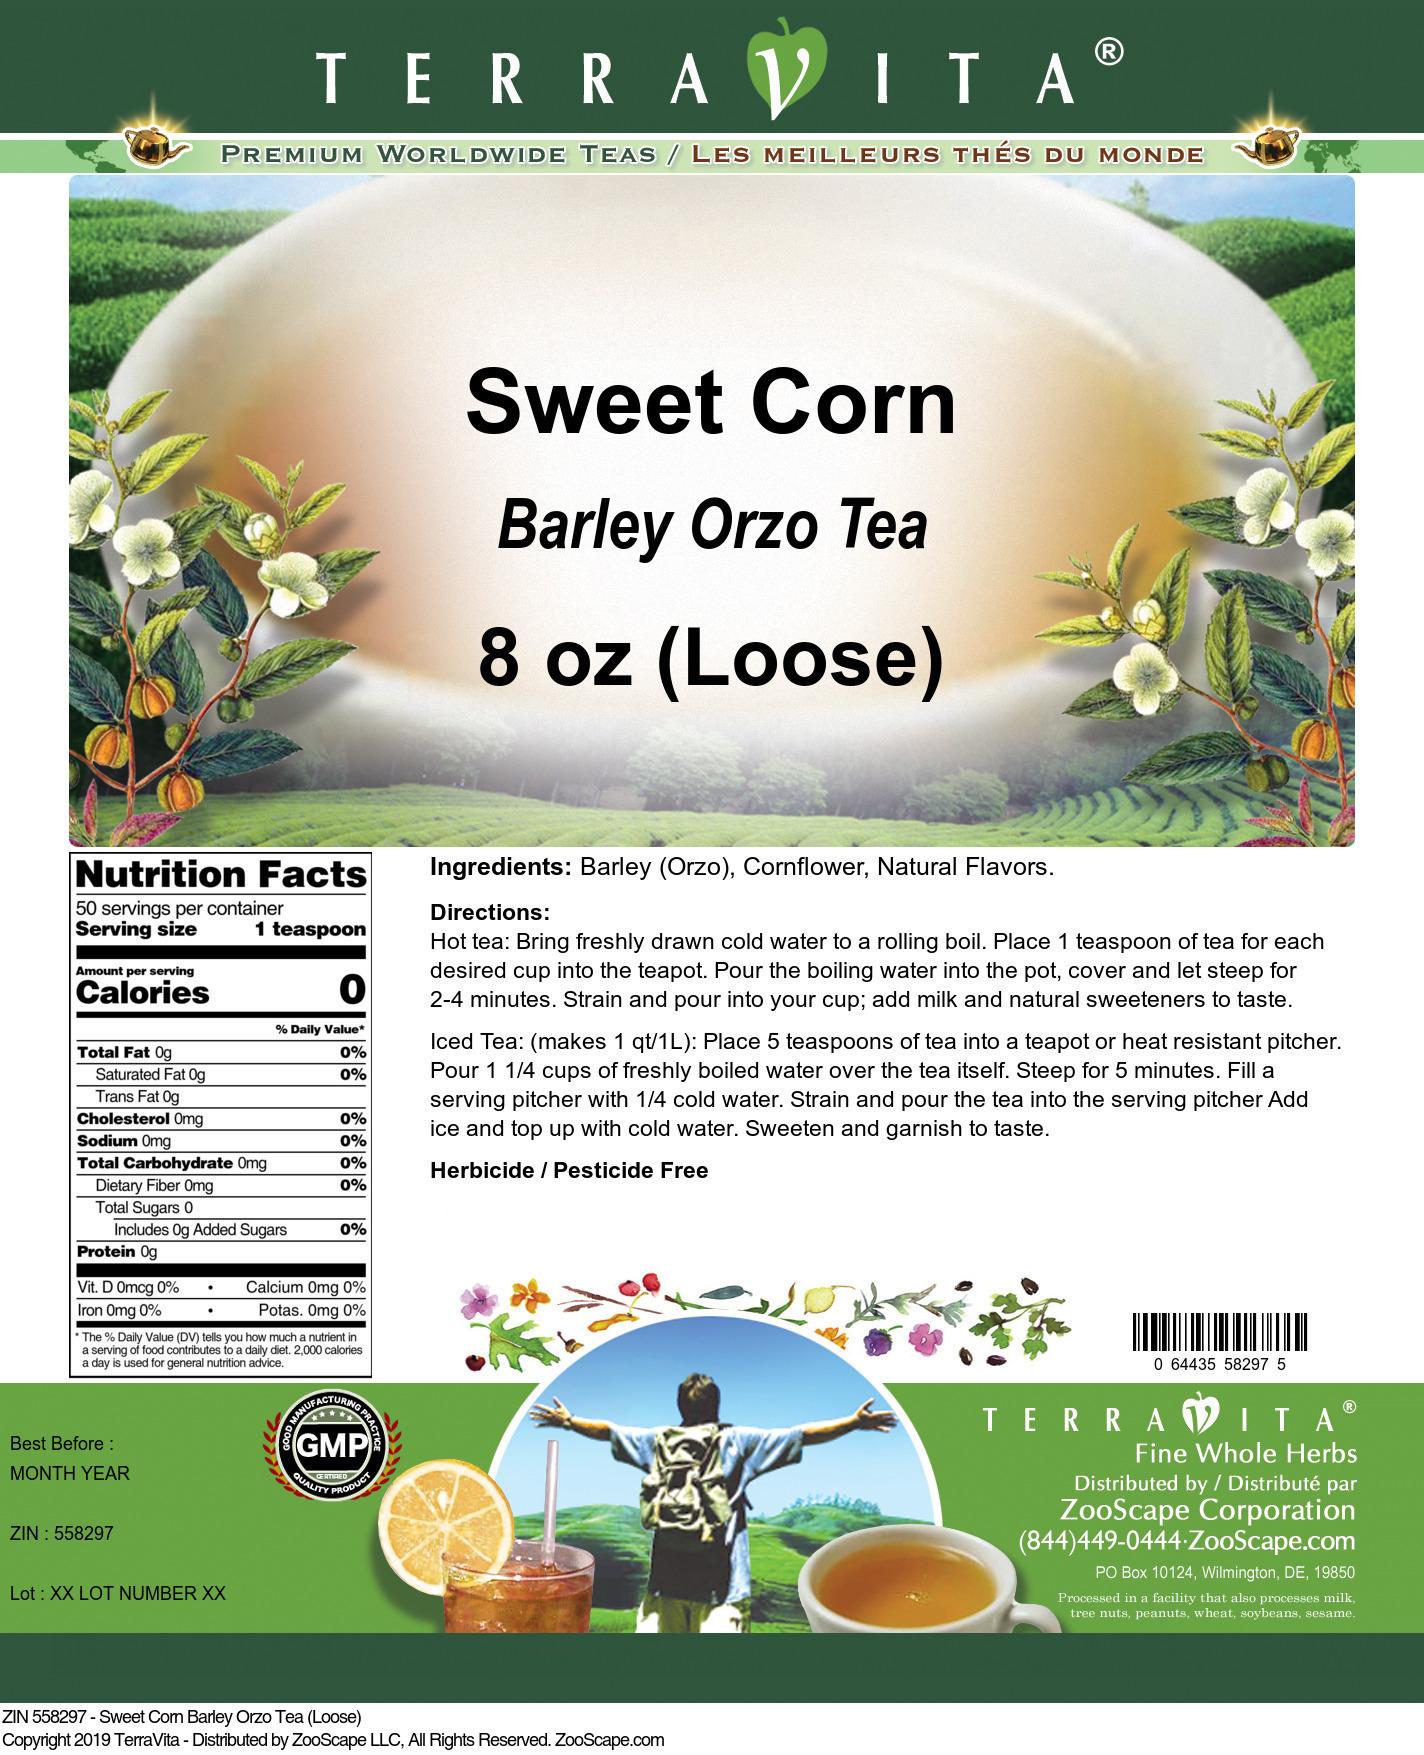 Sweet Corn Barley Orzo